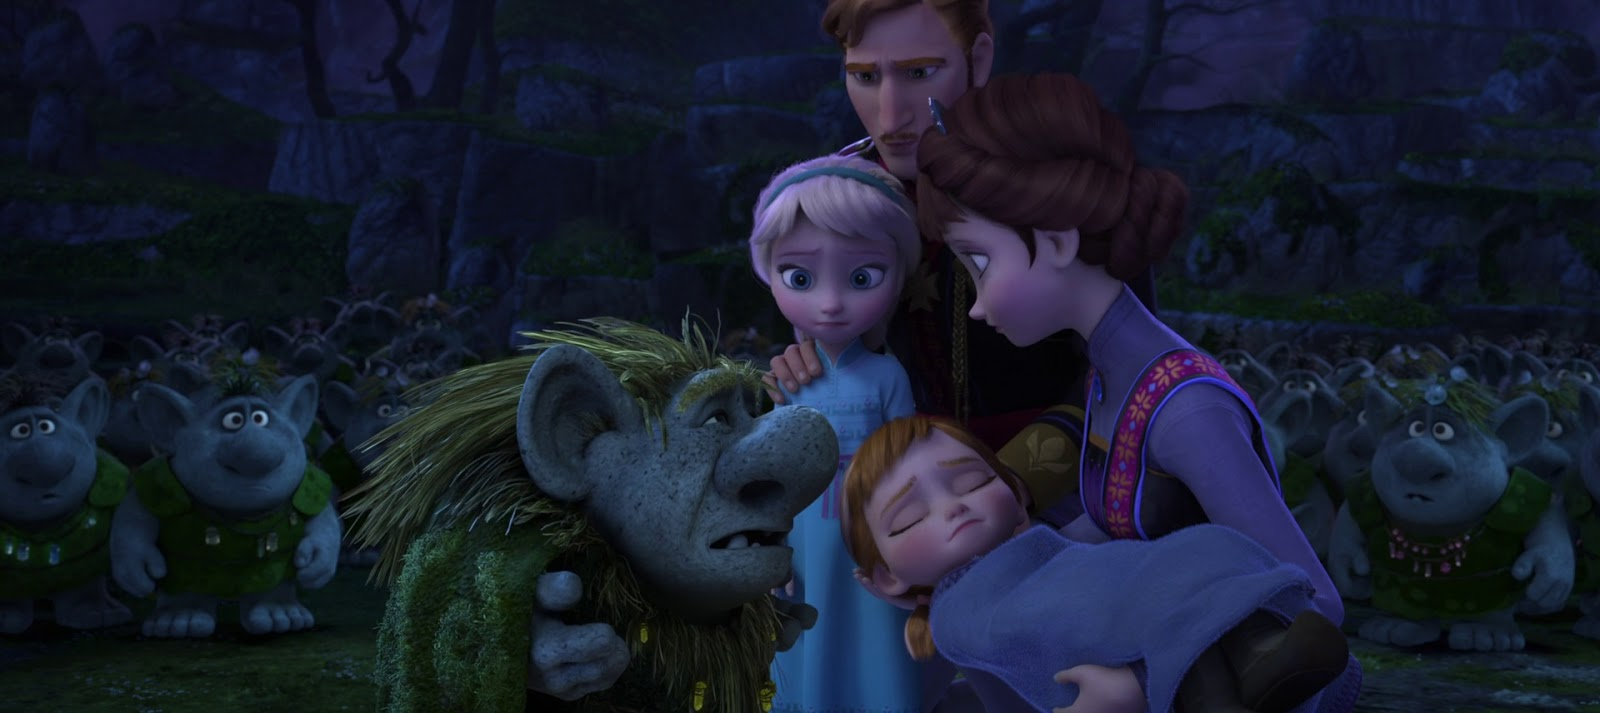 Frozen Full Hd 1080p Torrent Download Bothtels Blog